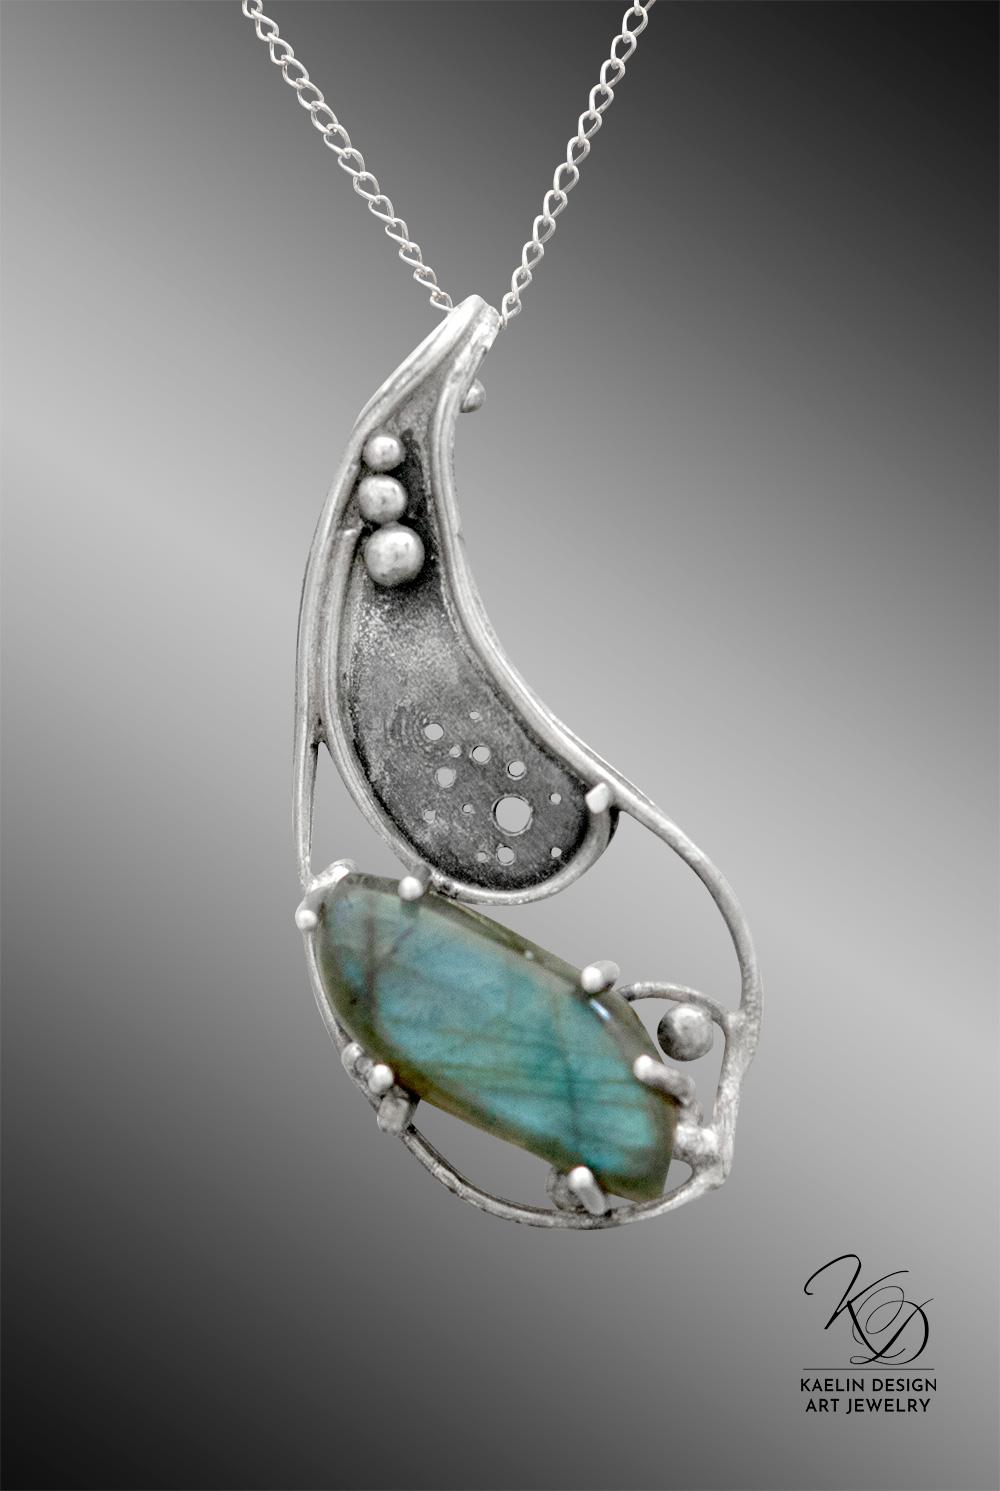 Darkening Deeps Labradorite Fine Art Jewelry Pendant by Kaelin Design